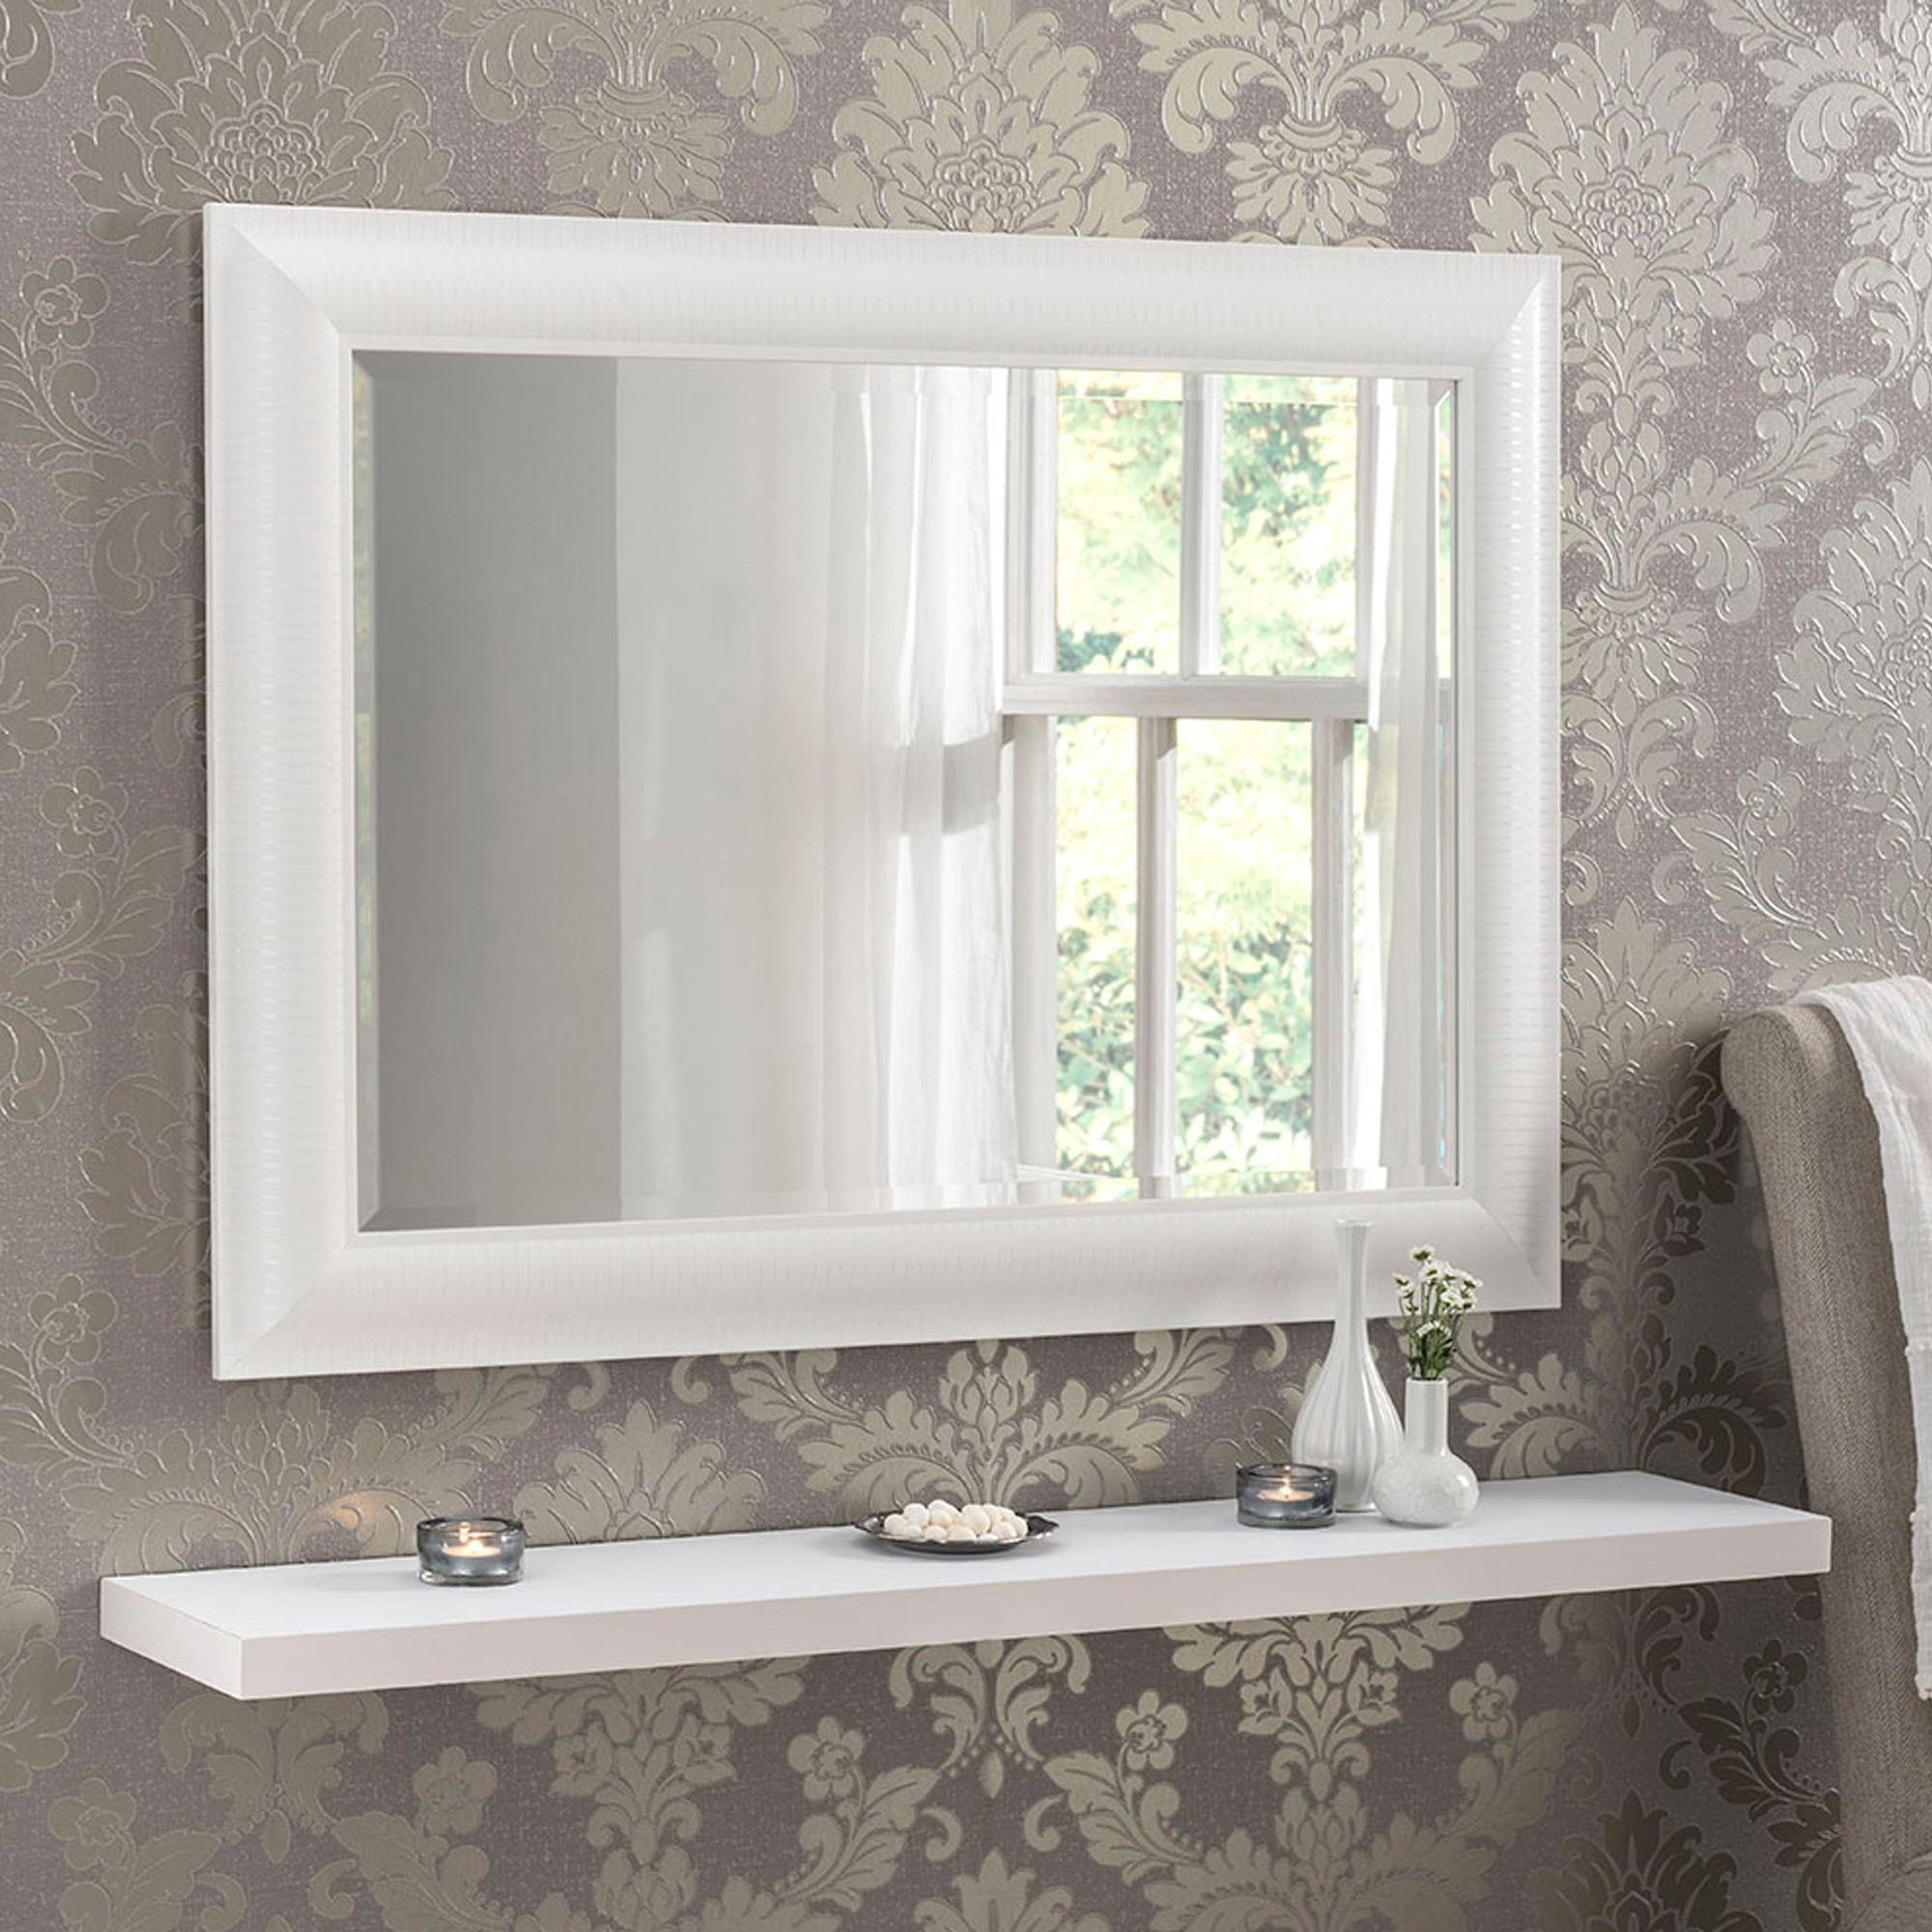 Decorative White Rectangular Bevelled Mirror